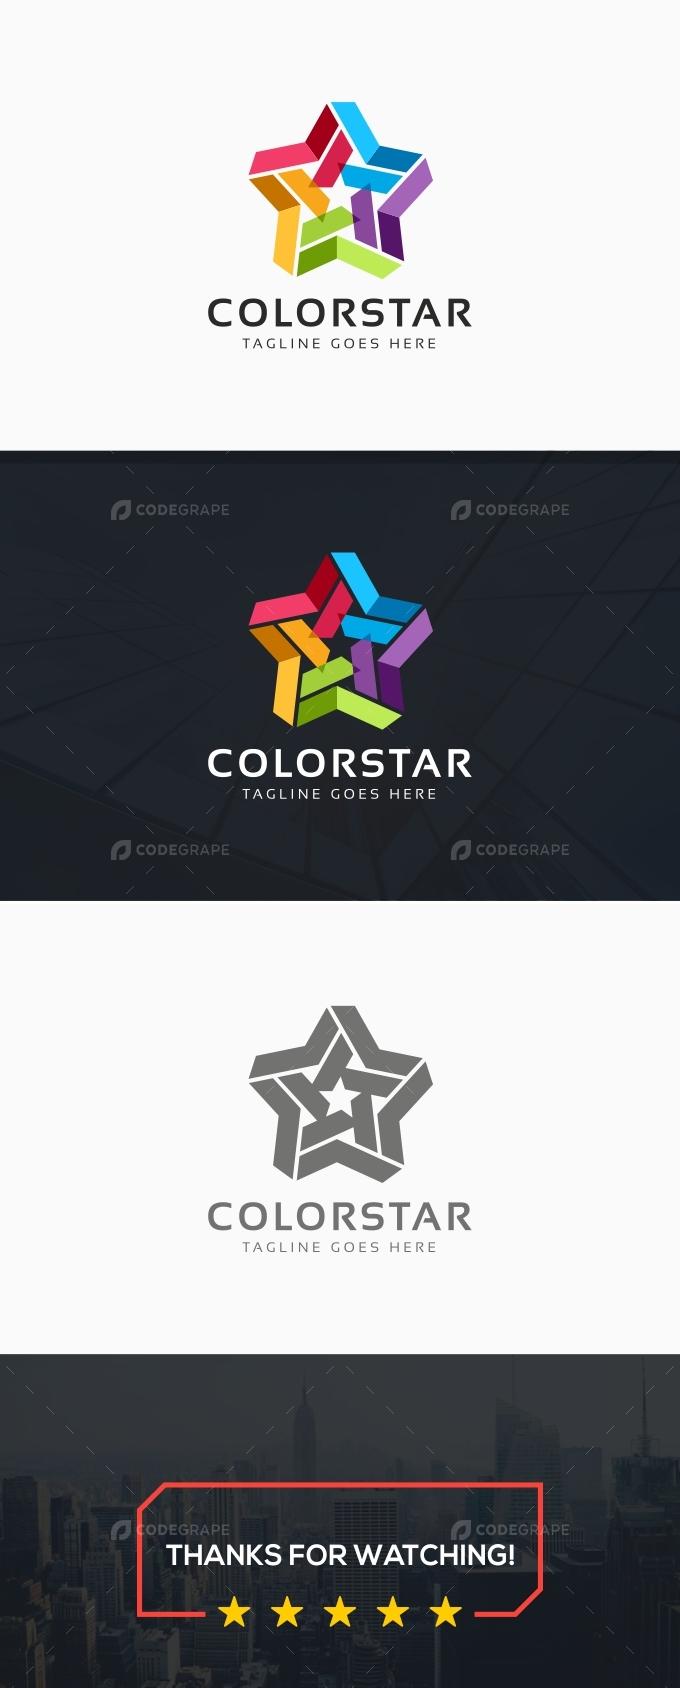 Creative Colorful Star Logo